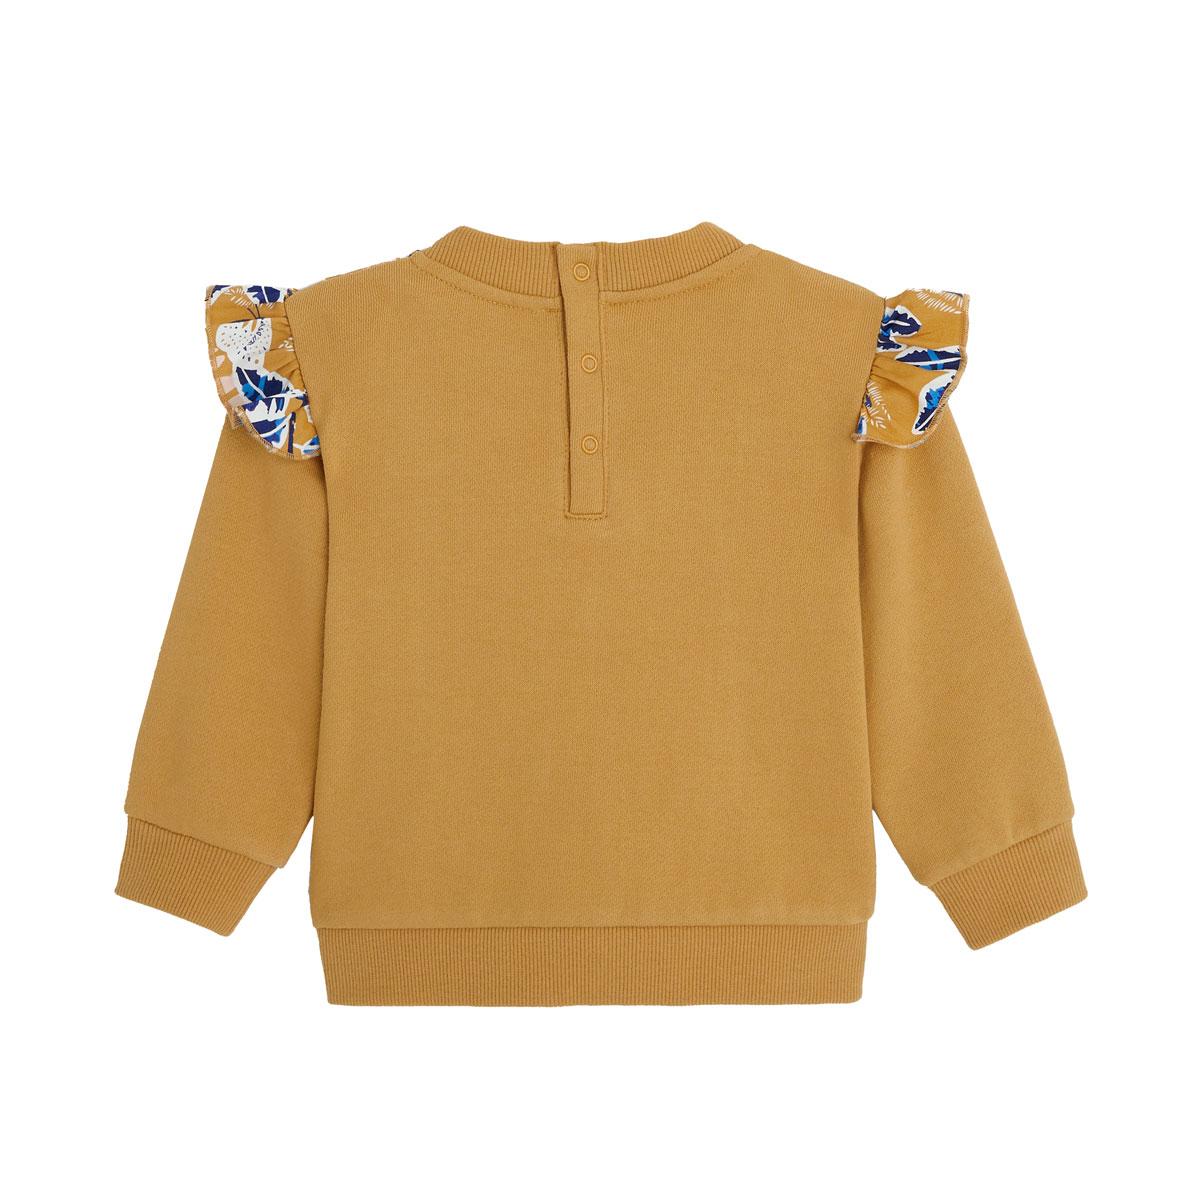 Sweat-shirt fille en coton gratté Hanoi dos